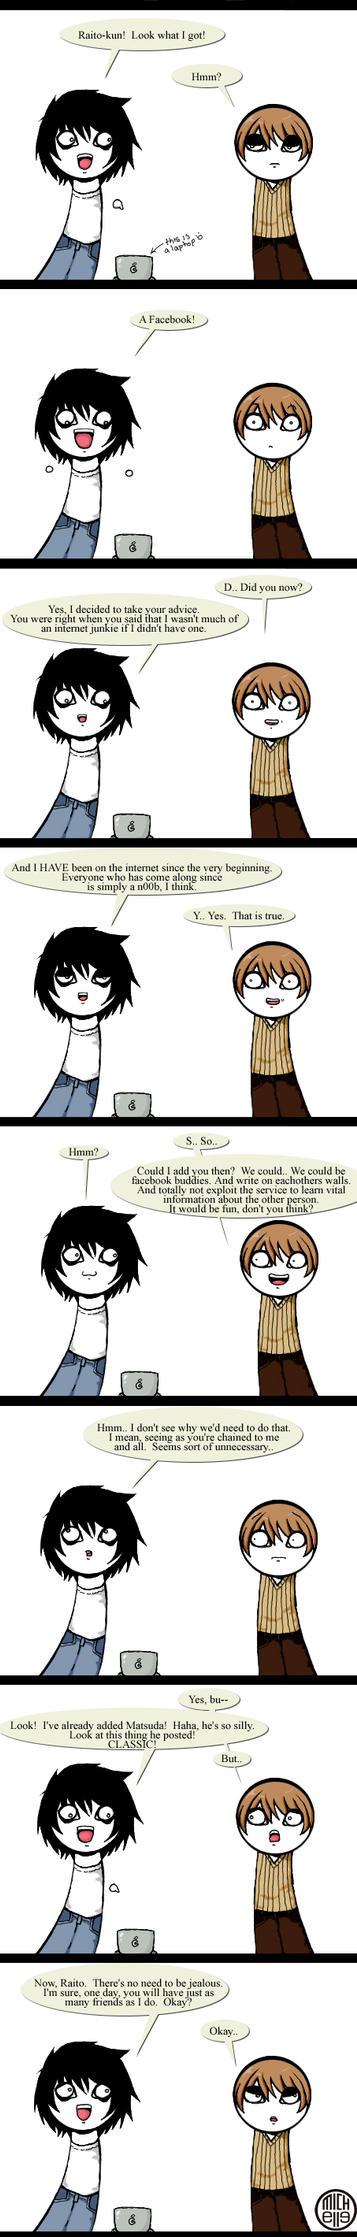 Death Note - Facebook. by kuroineko